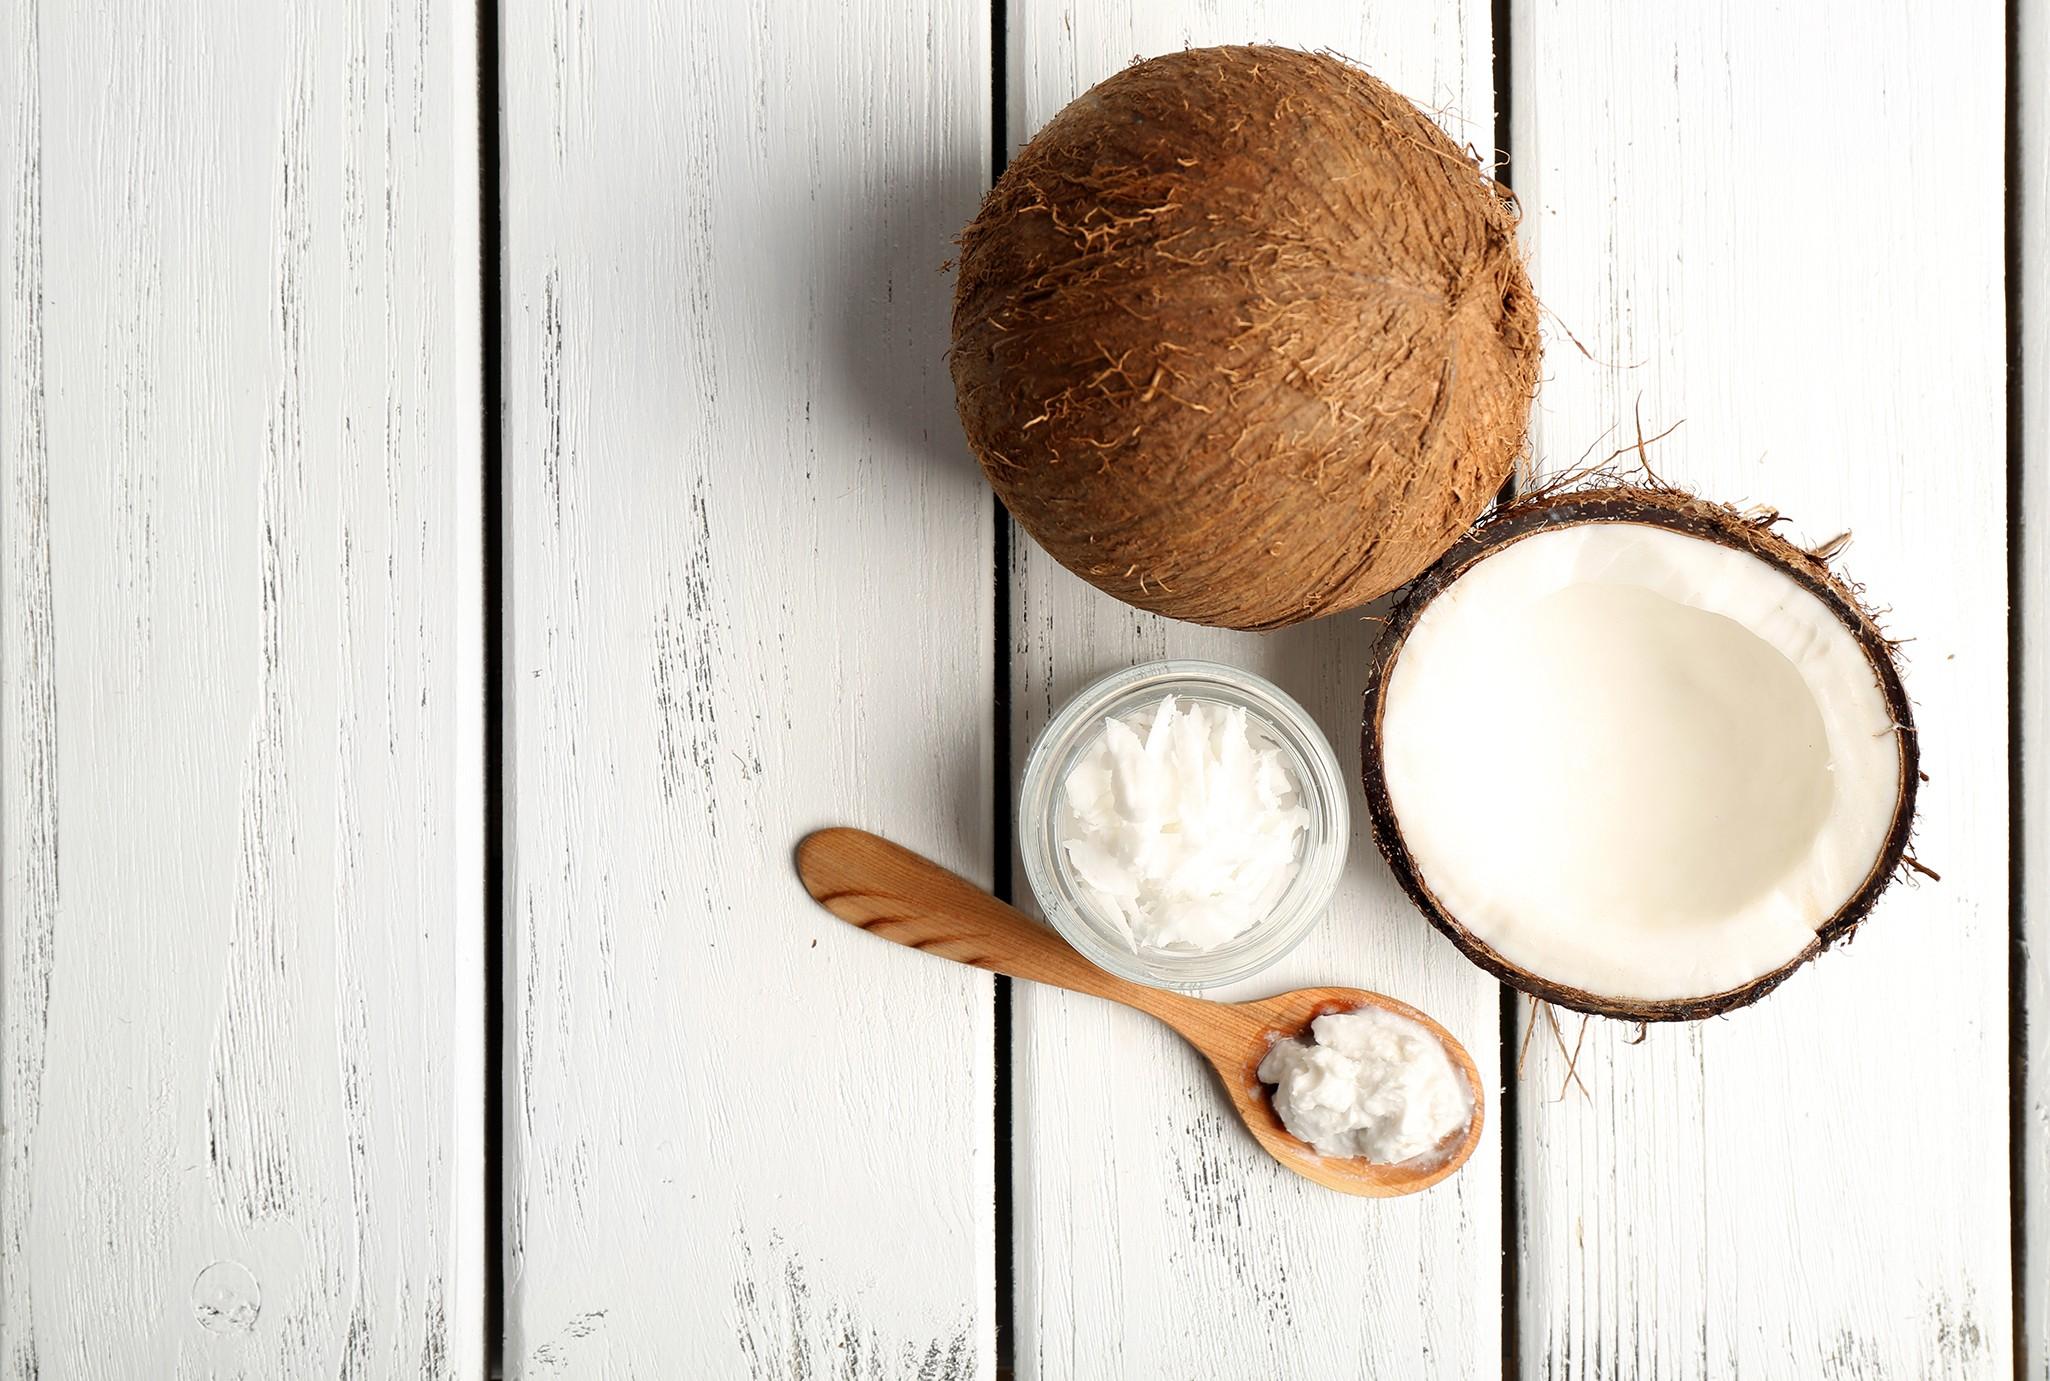 Ococonut-image-1